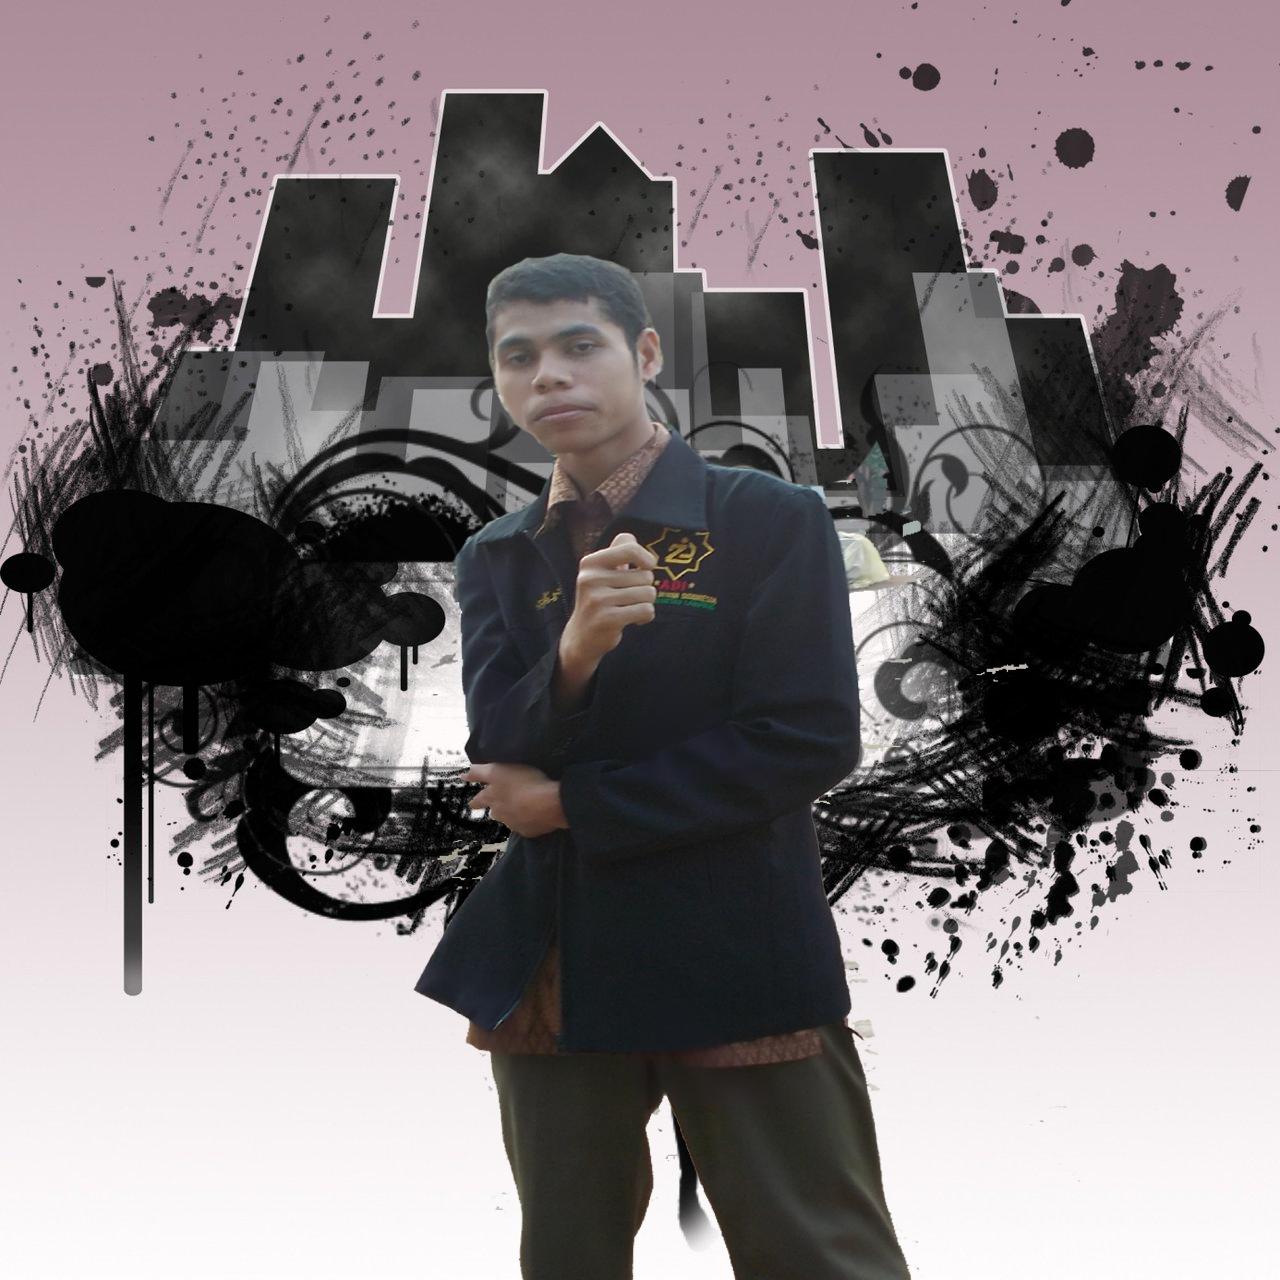 Designer by: Amriadi/http://adidesigners.blogspot.com/